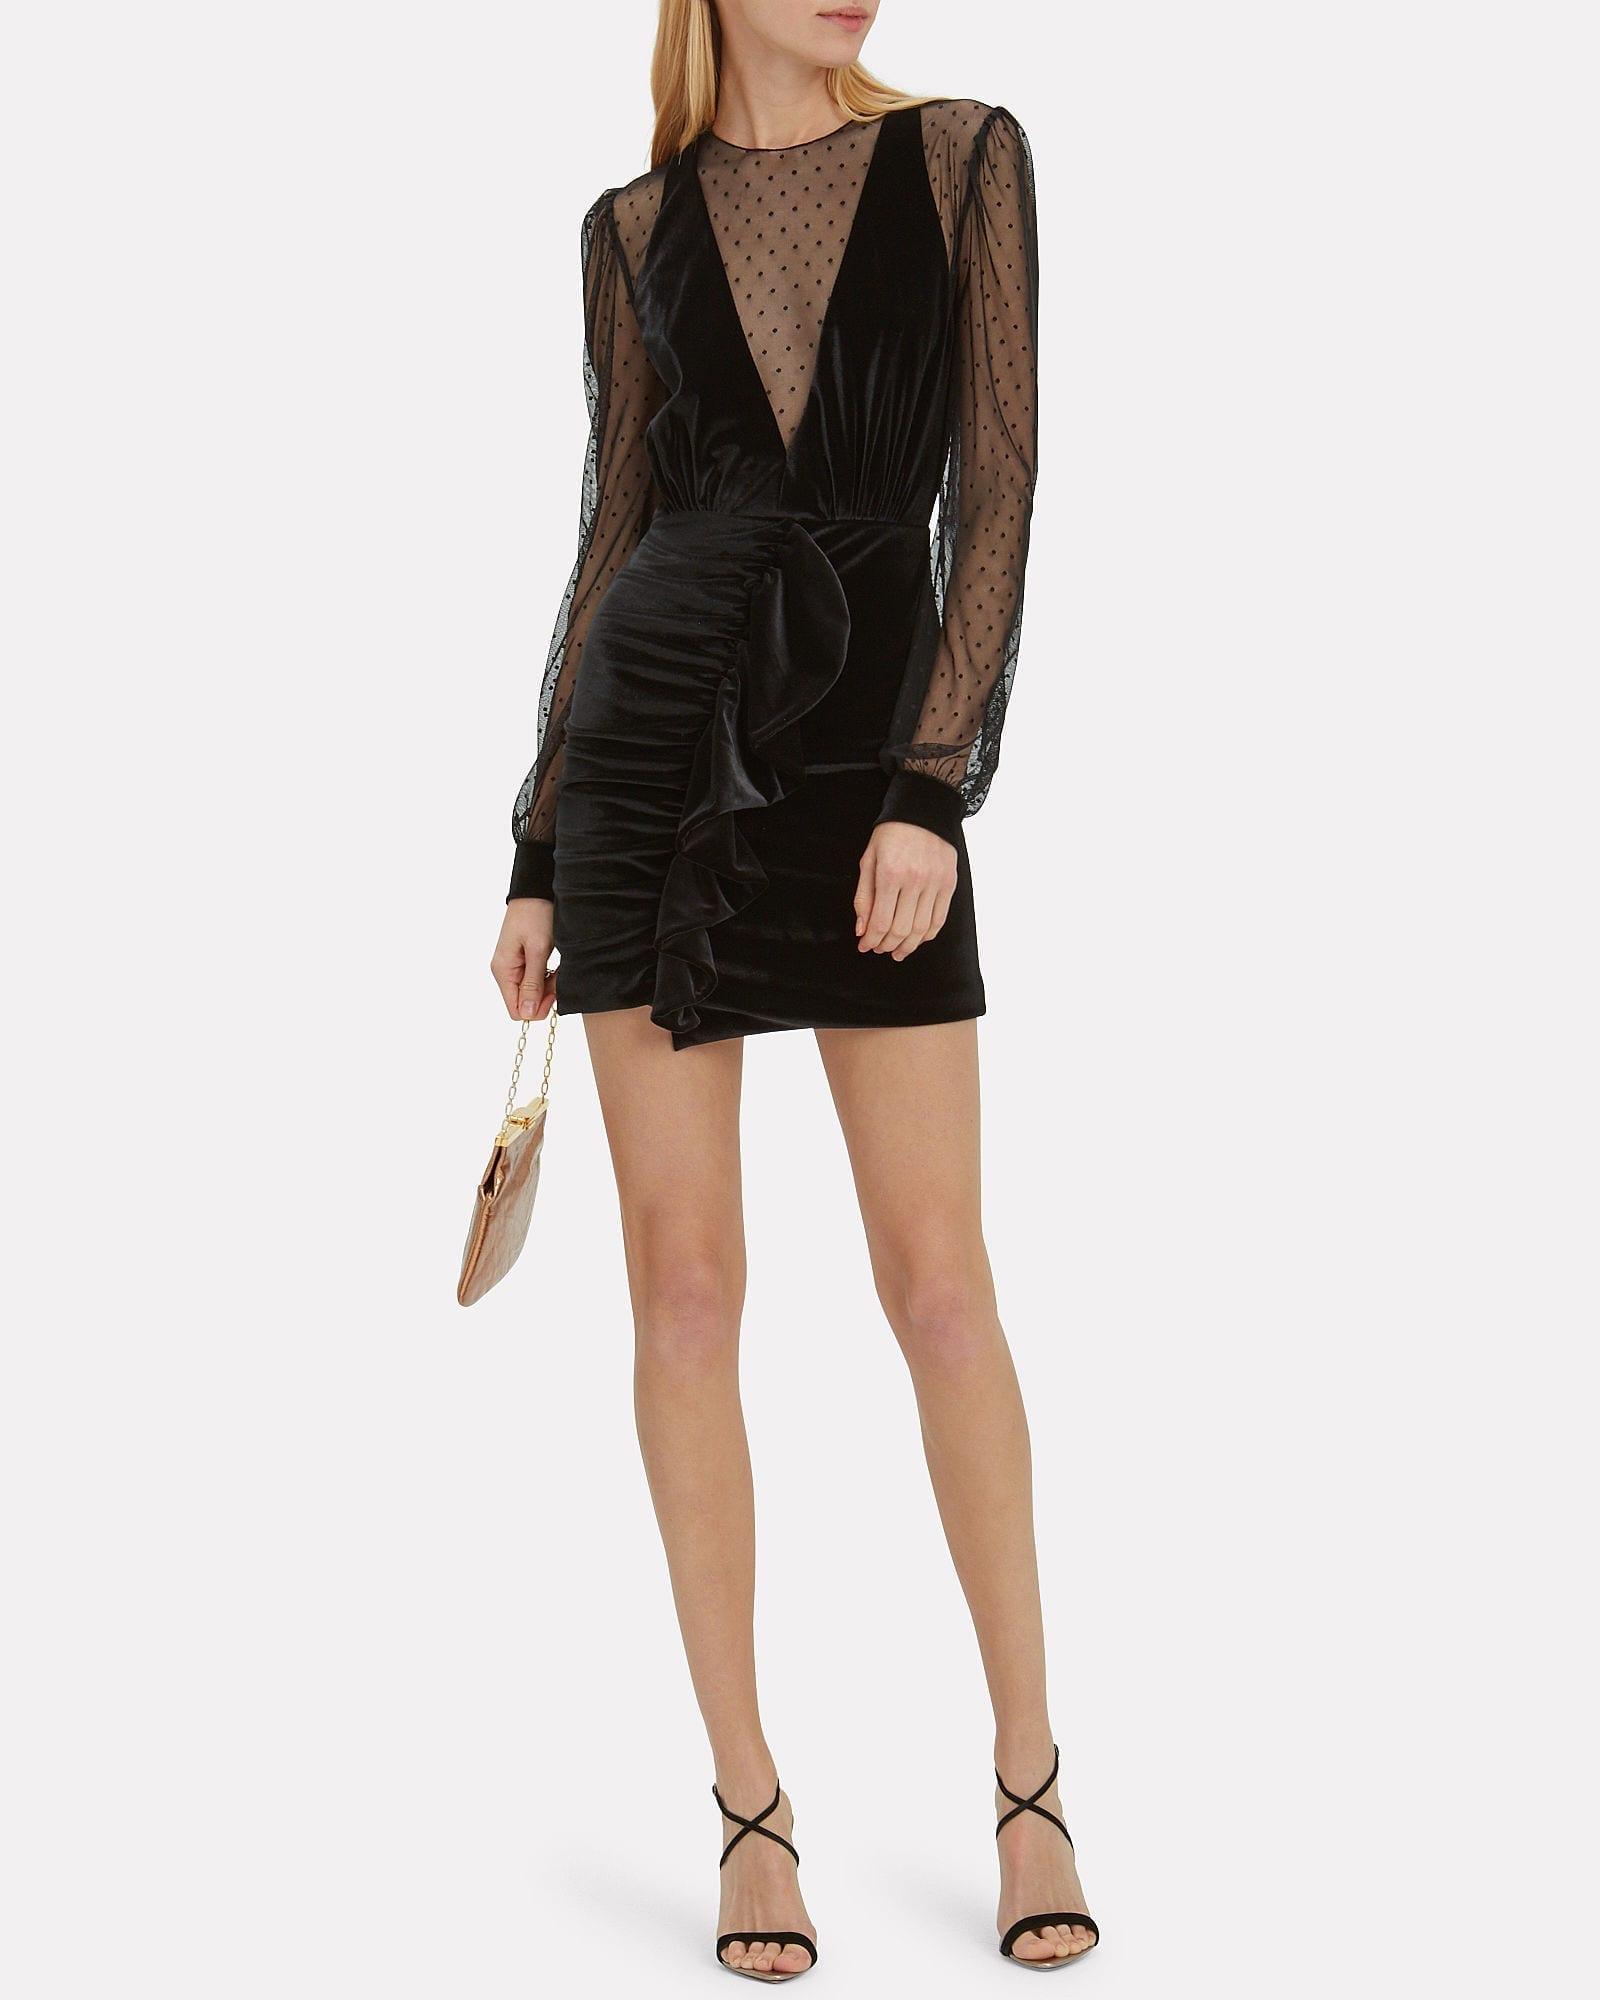 PATBO Velvet Tulle Mini Black Dress